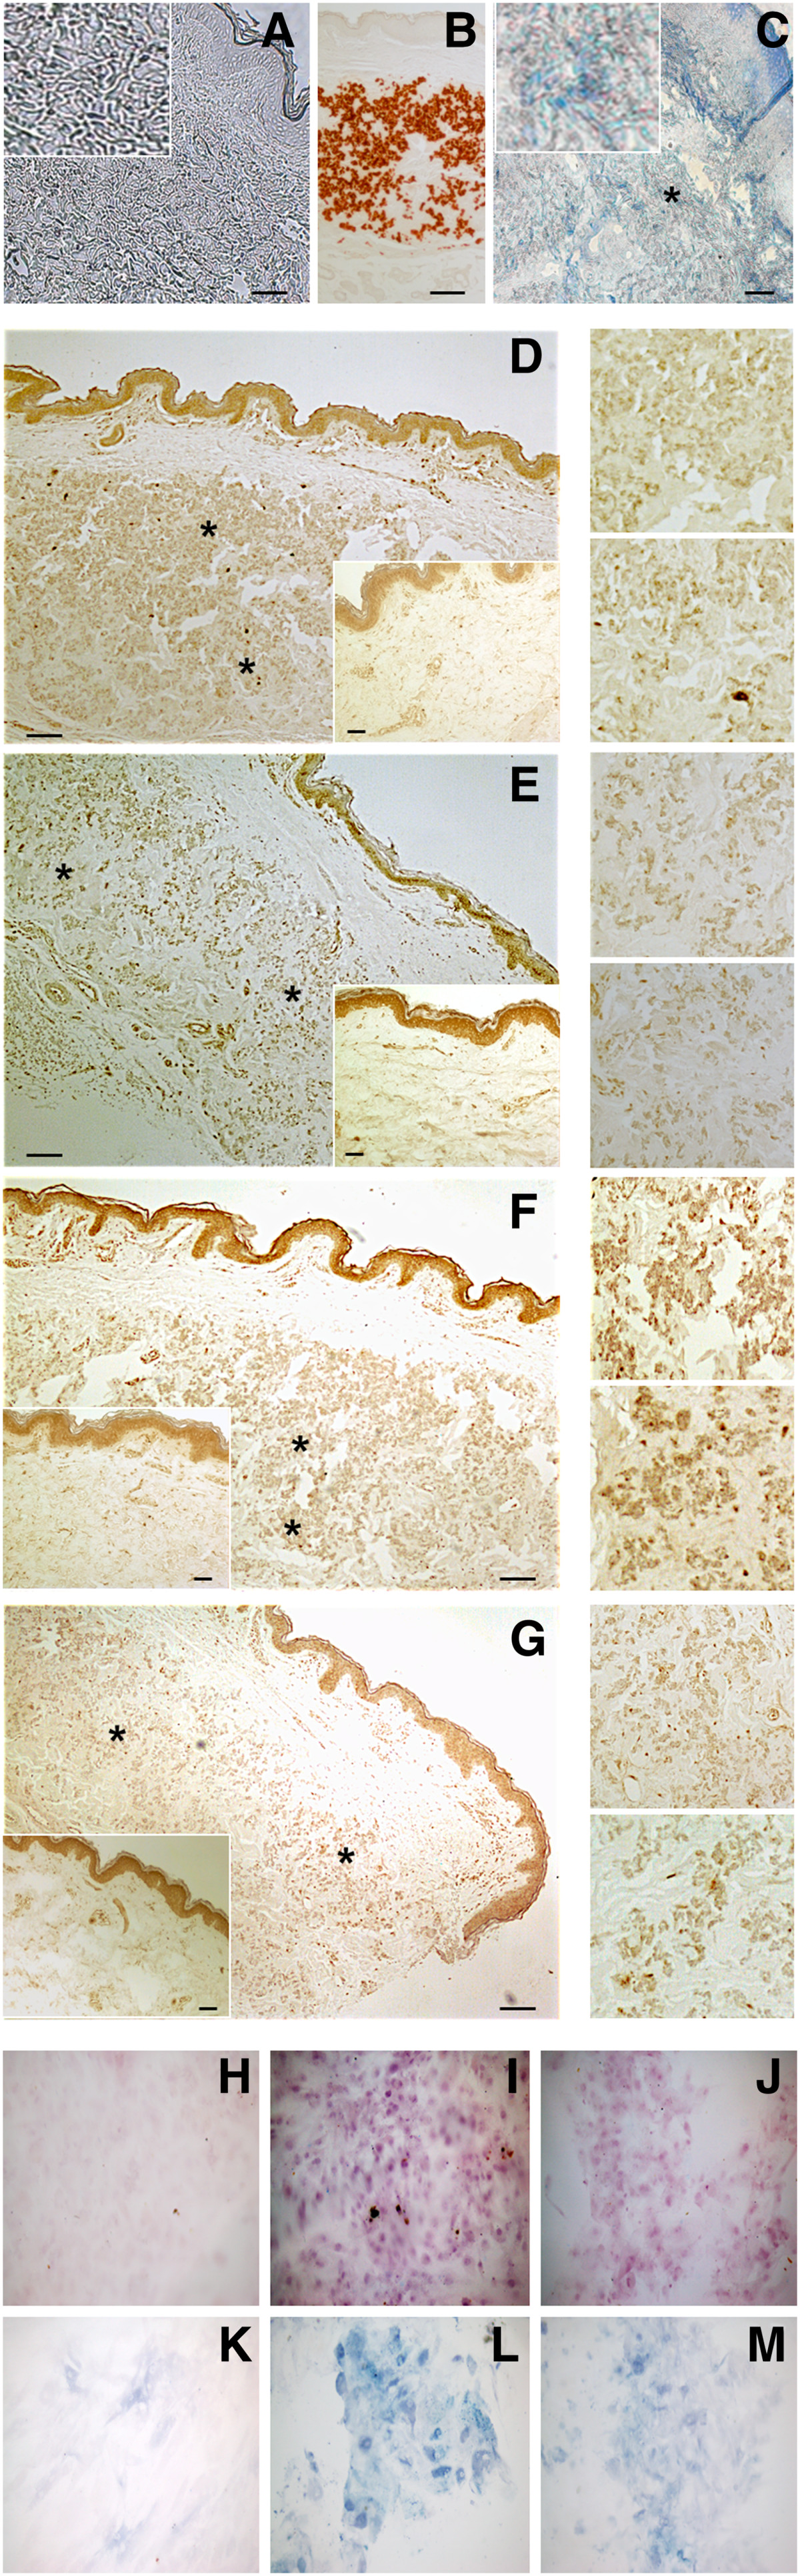 Perturbation Of Specific Pro Mineralizing Signalling Pathways In